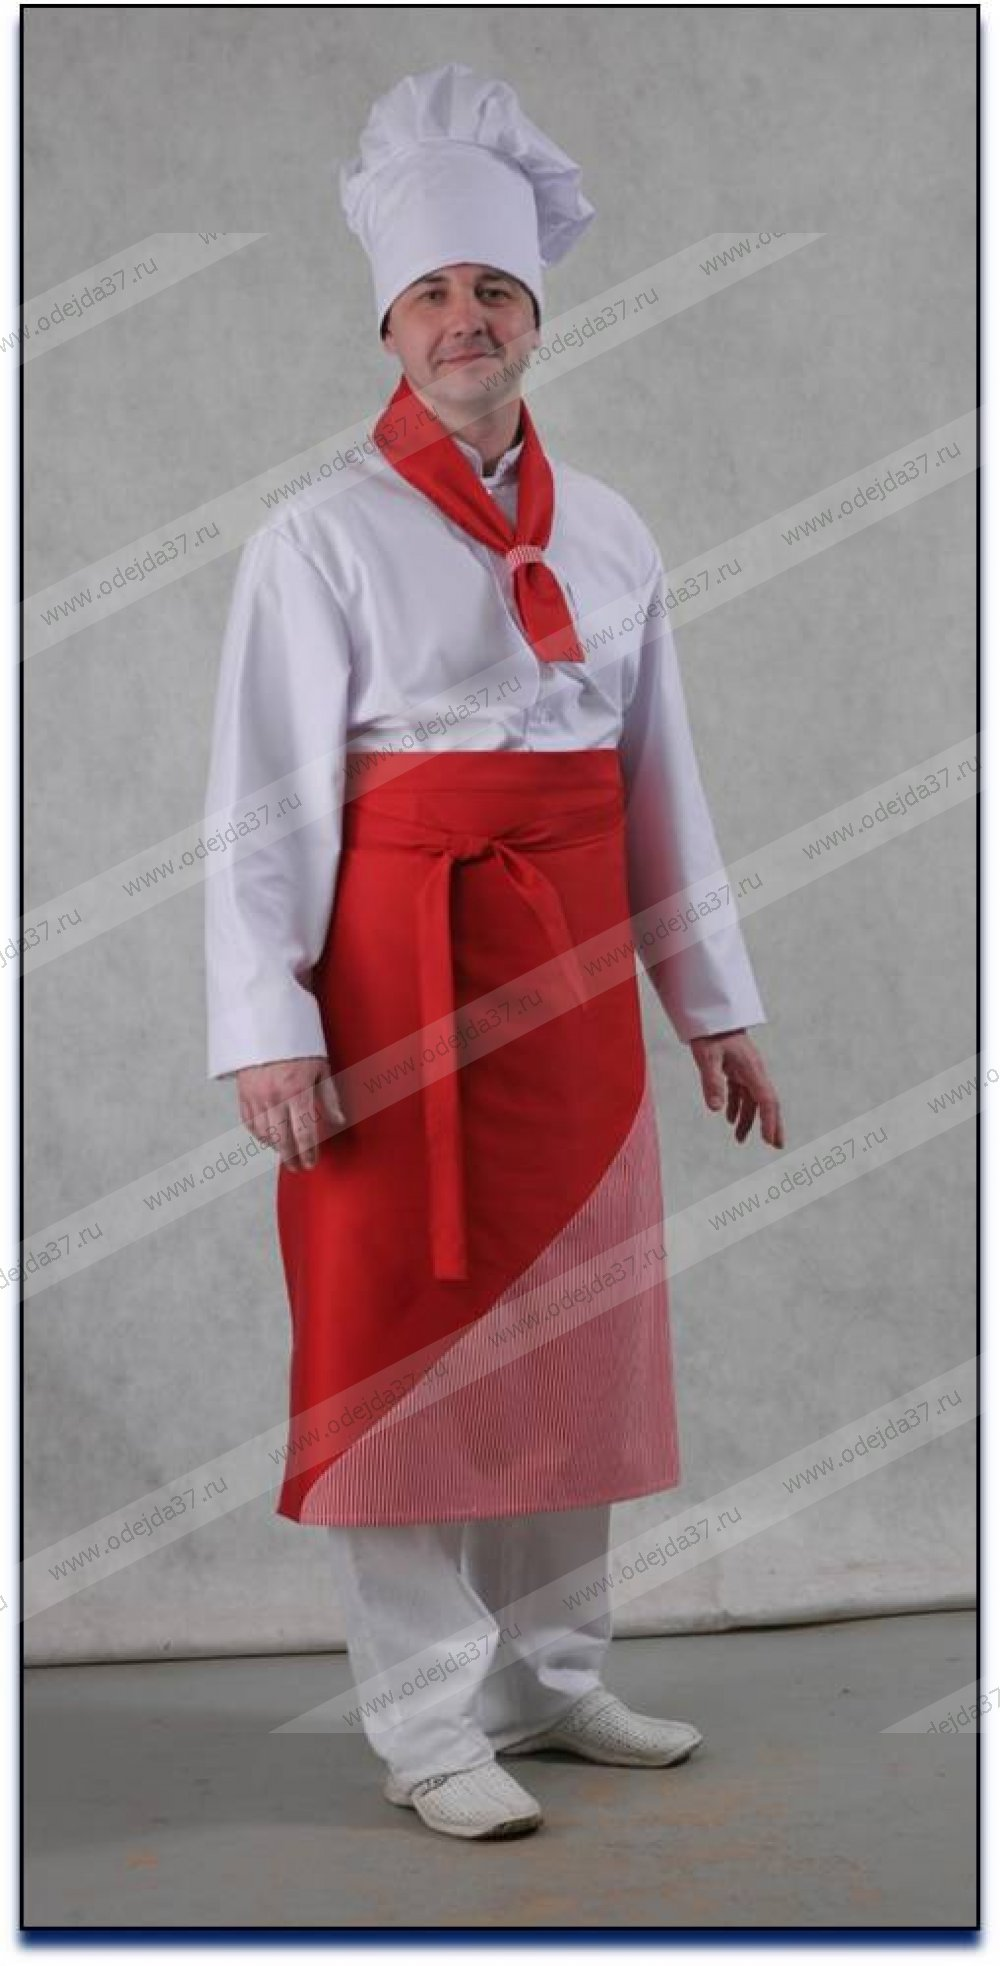 Увеличить - Курткам повара (тиси) №212